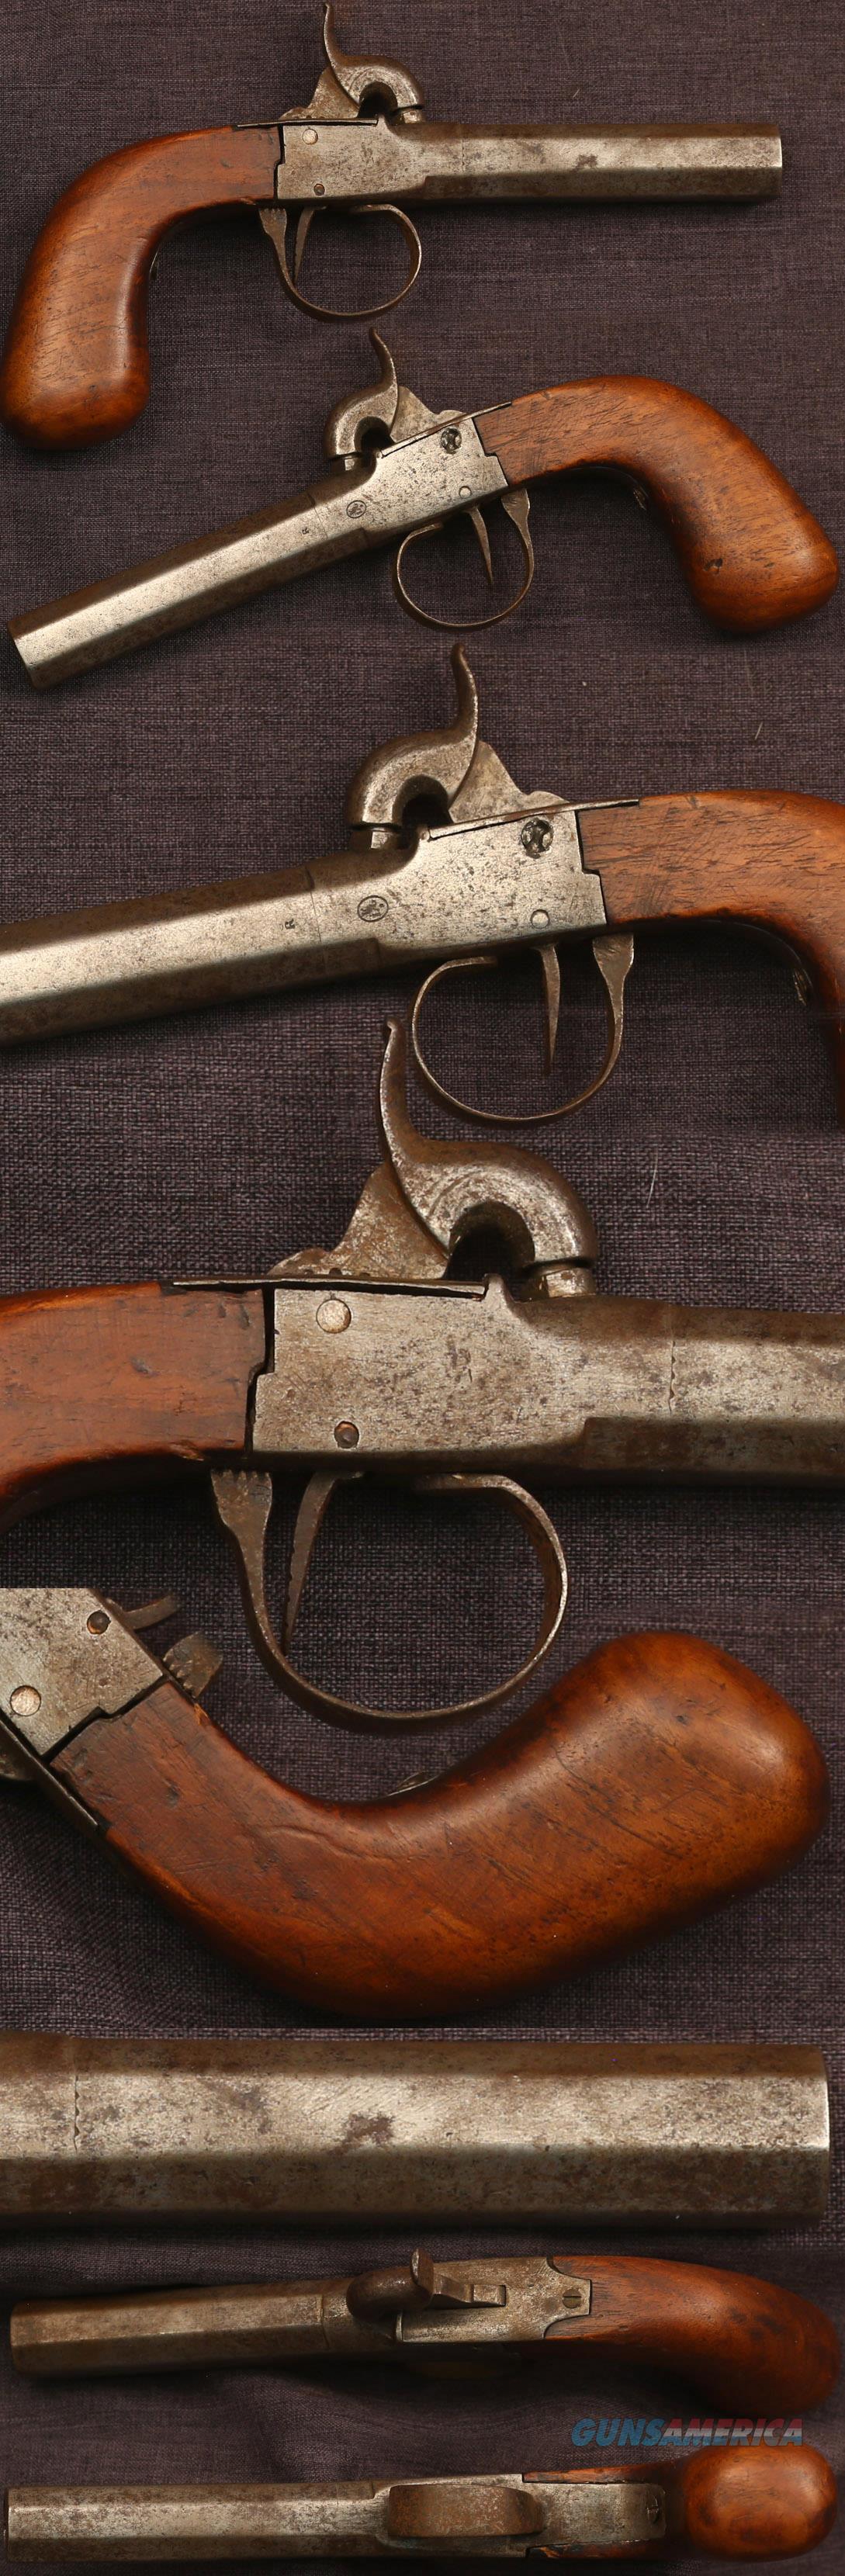 plain Percussion boxlock pistol  Guns > Pistols > Muzzleloading Pre-1899 Pistols (perc)